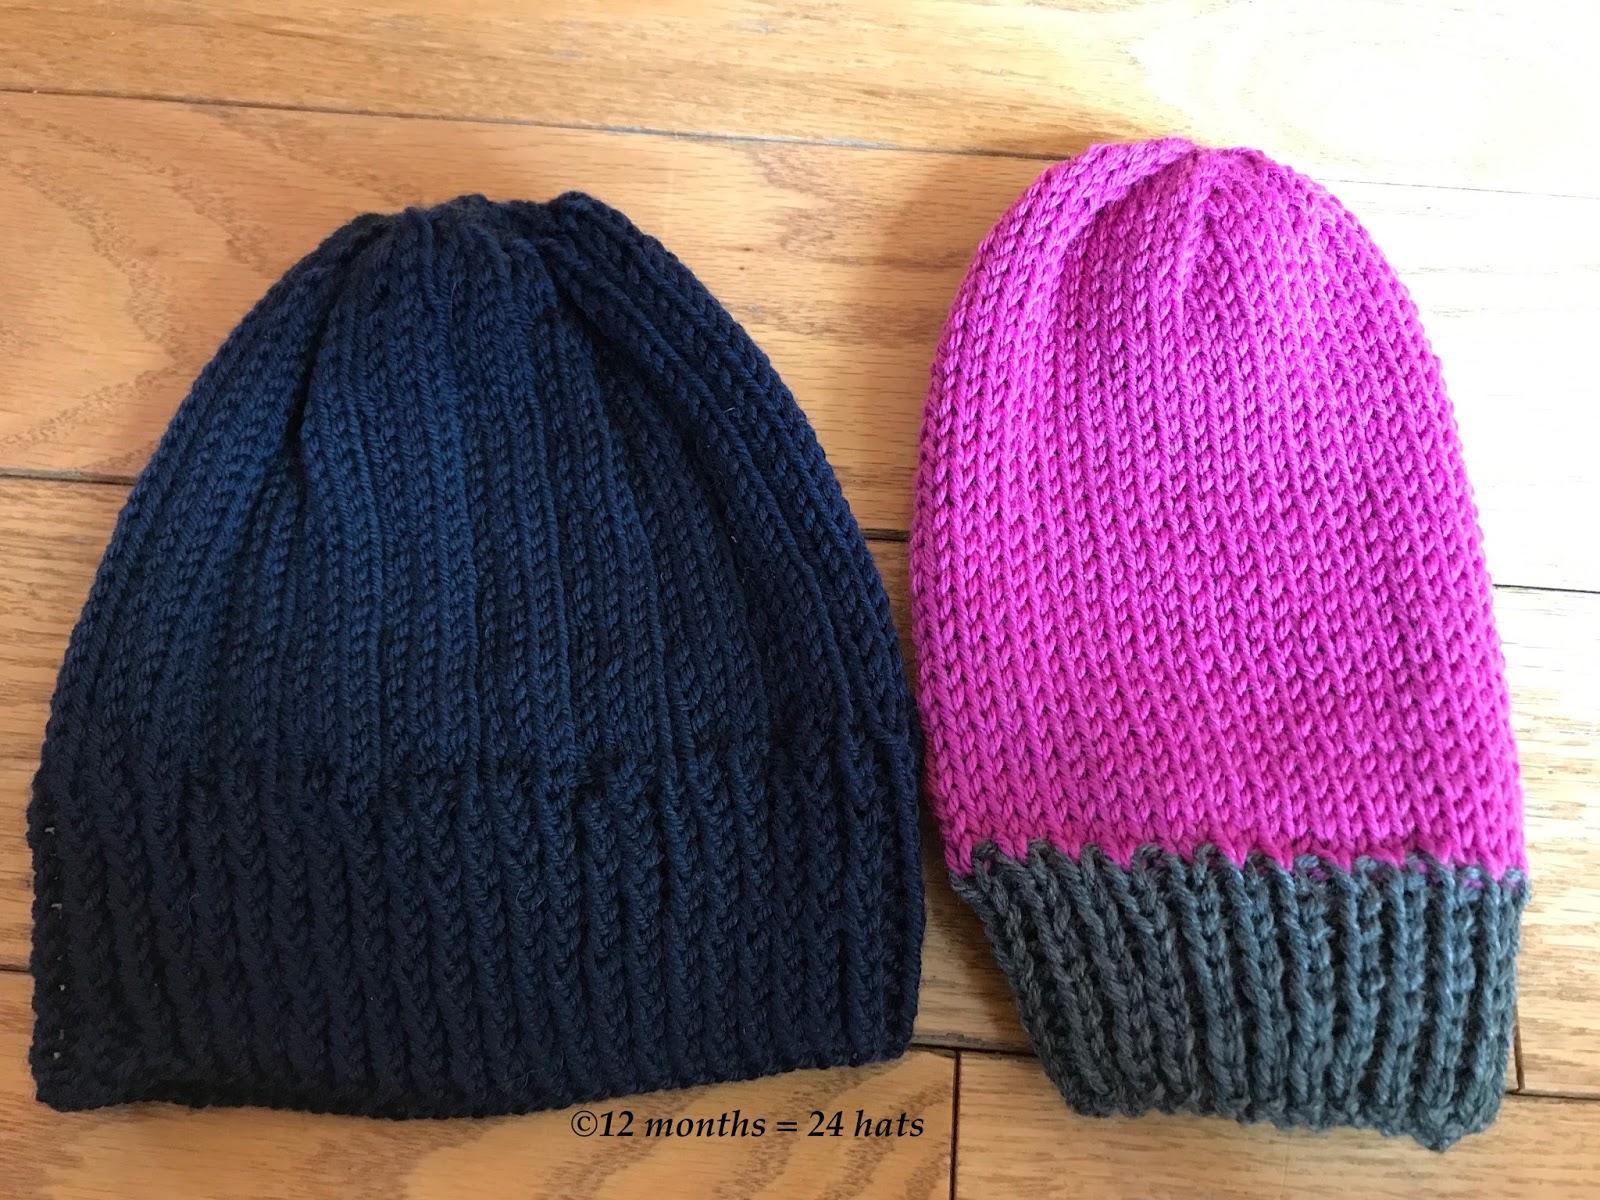 12 months = 24 hats